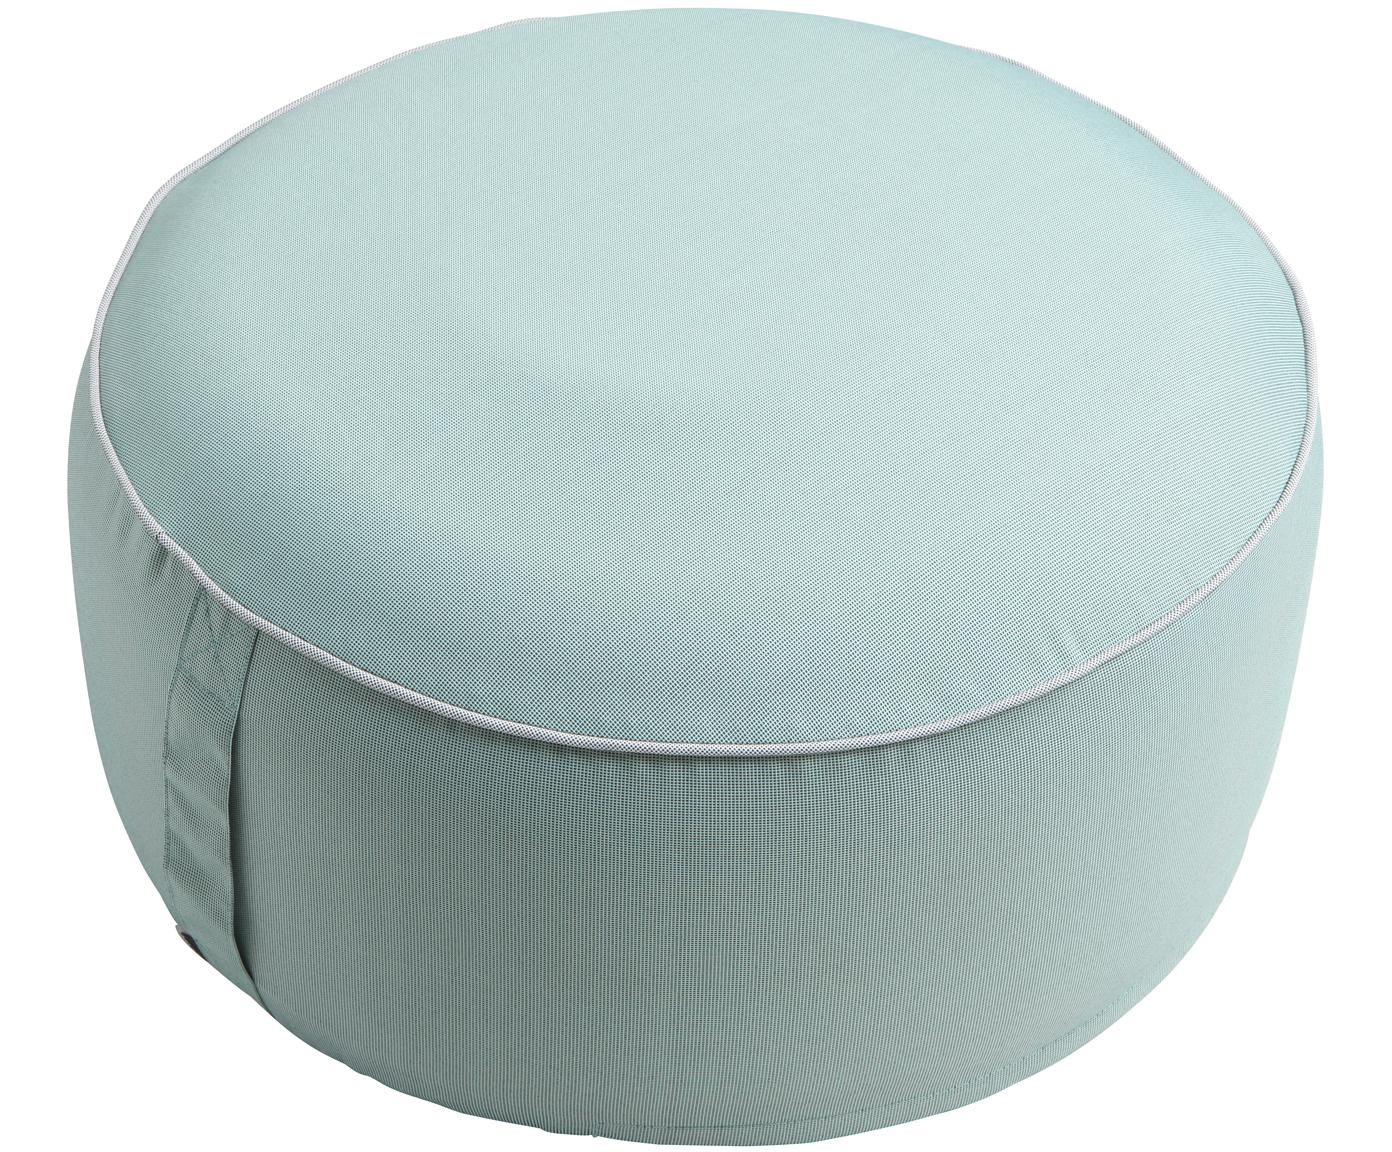 Pouf da esterno gonfiabile Maxime, Rivestimento: poliestere, resistente ai, Verde menta, nero, Ø 55 x Alt. 25 cm